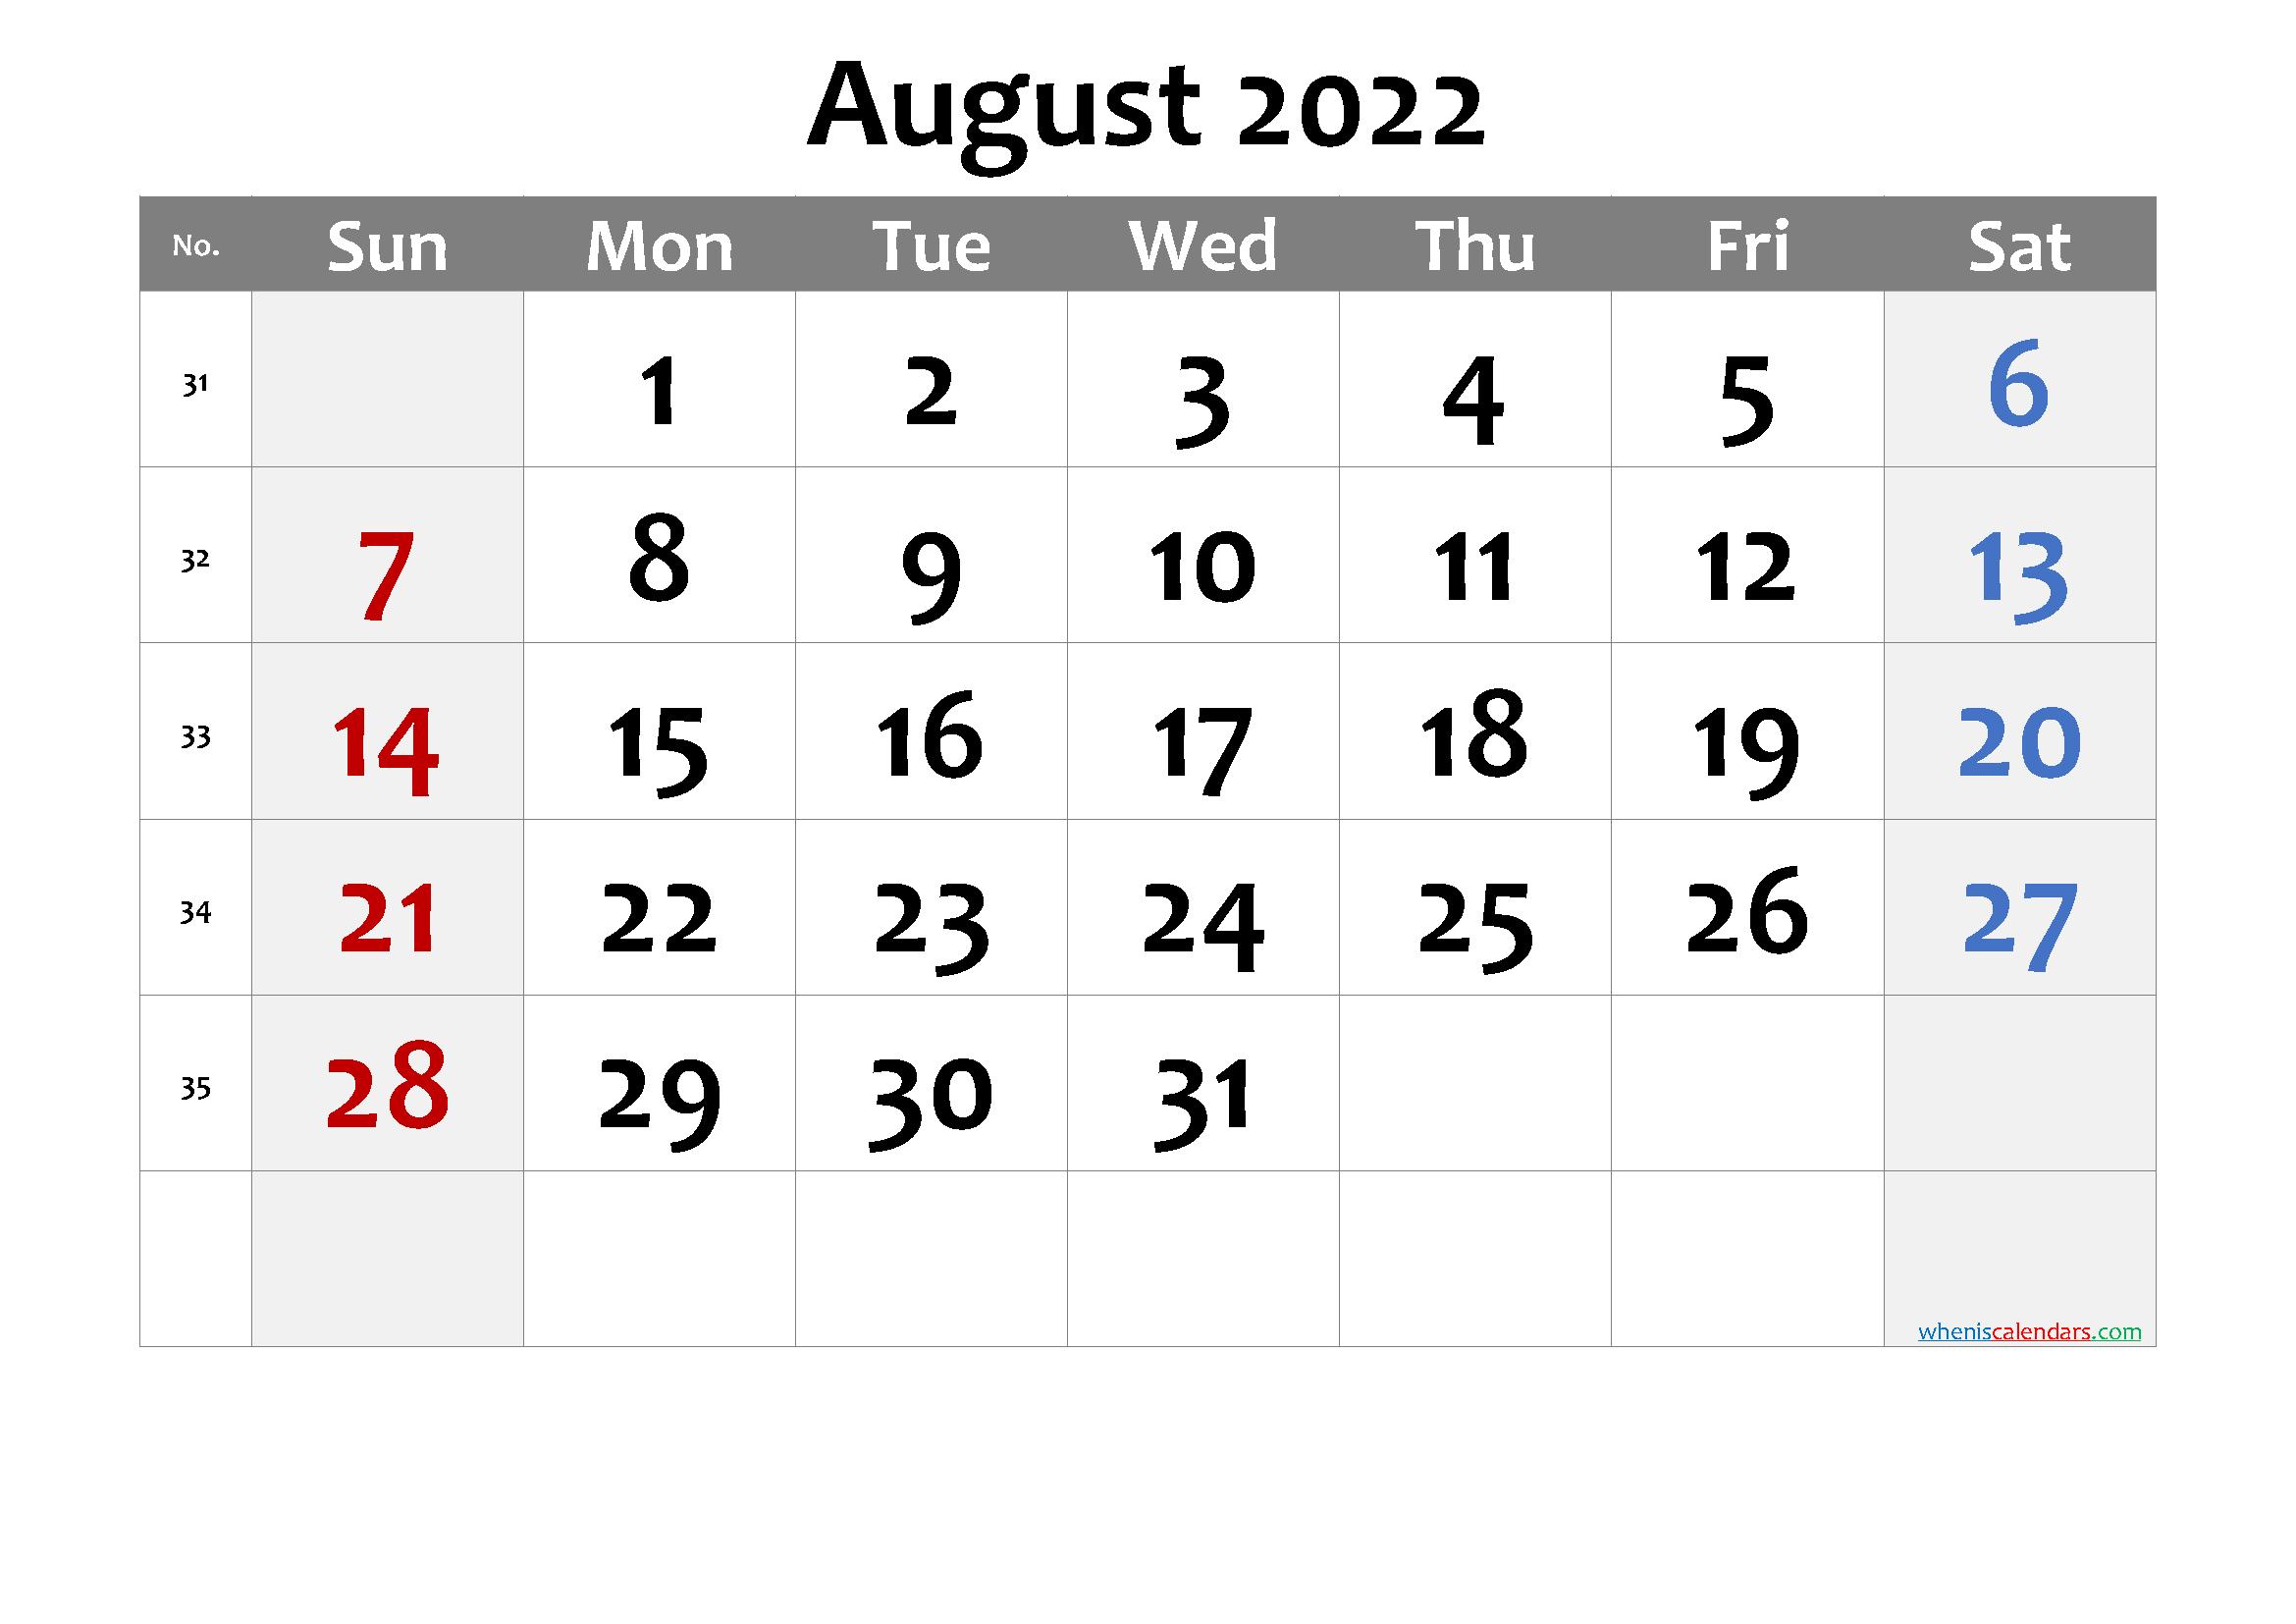 Printable August 2022 Calendar With Holidays - 6 Templates regarding Free Printable Calendar August 2022 Graphics